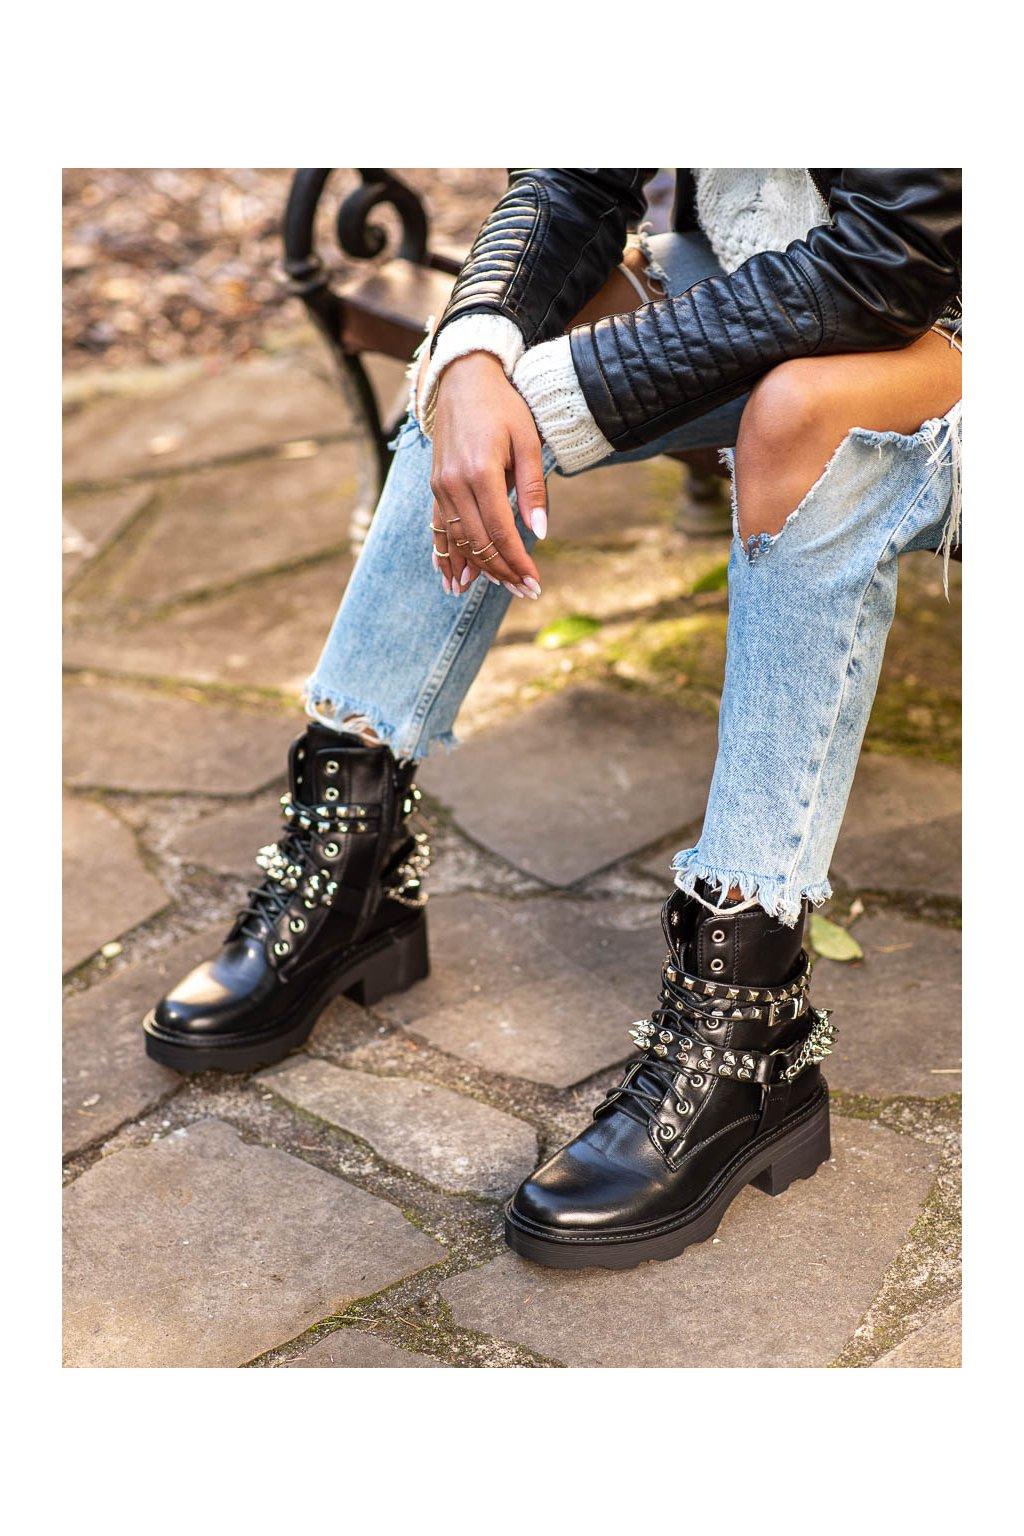 Čierne dámske topánky Seastar kod NC1028B